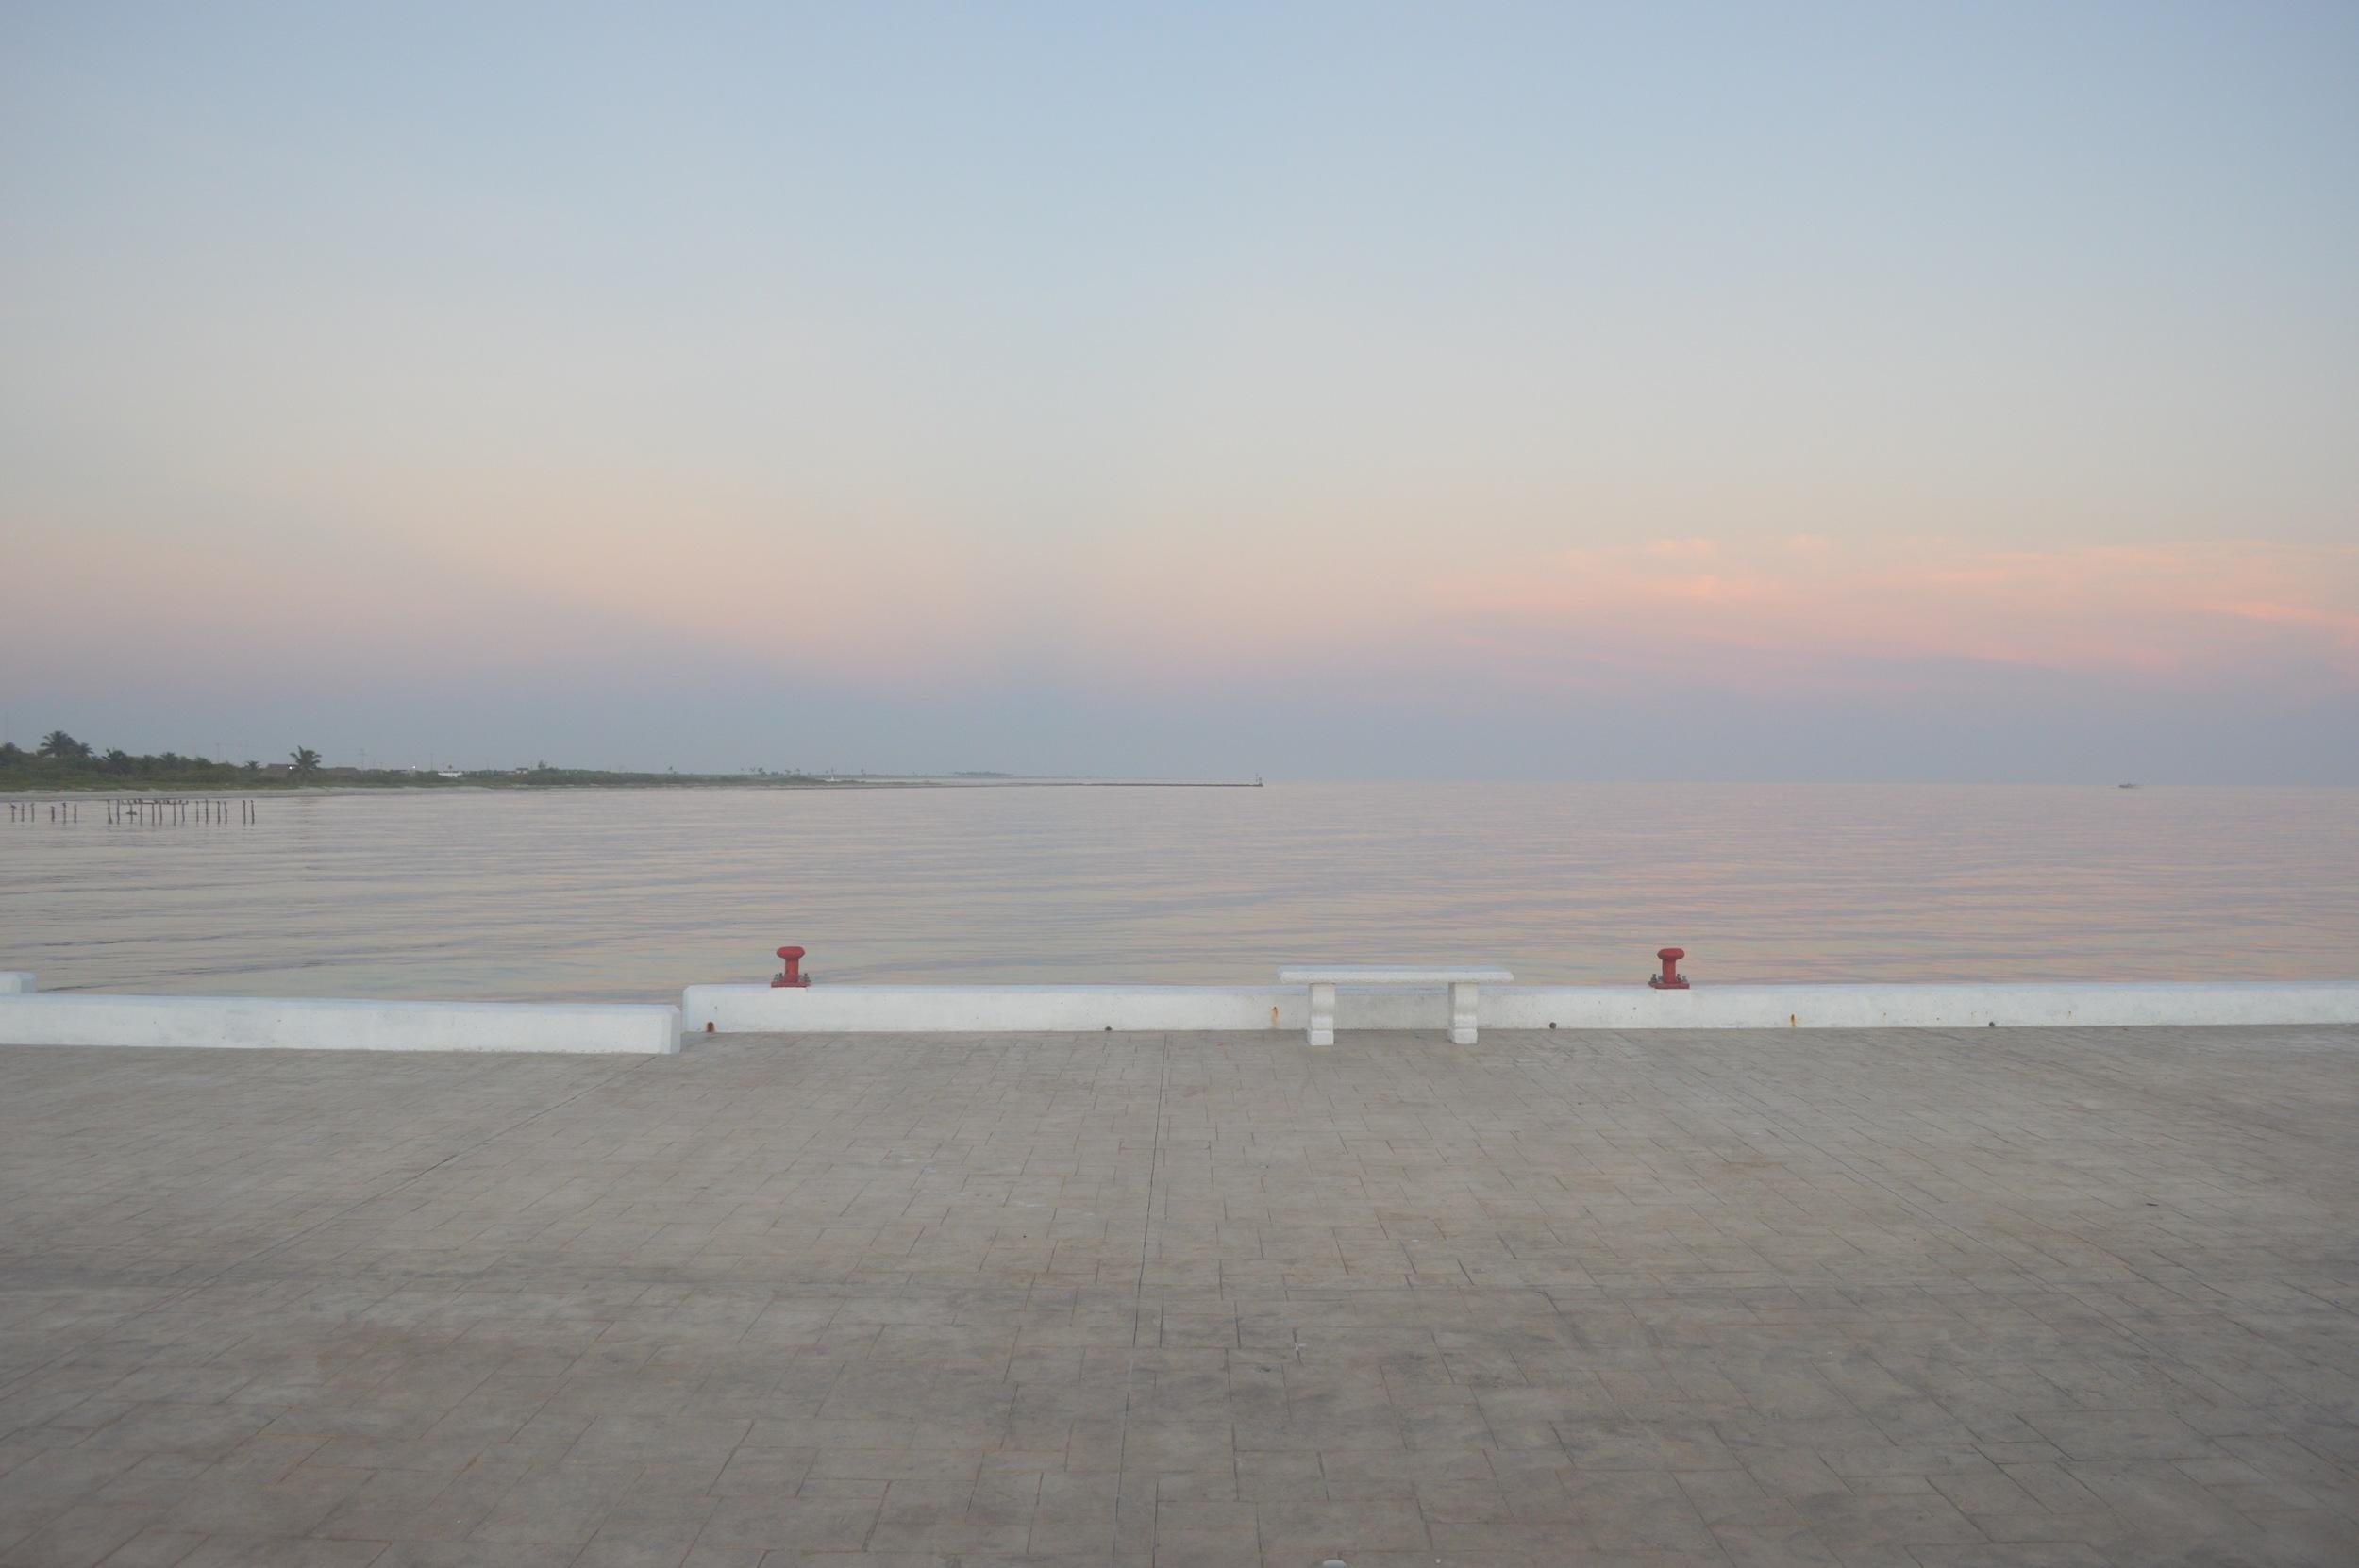 Sunrise in El Cuyo